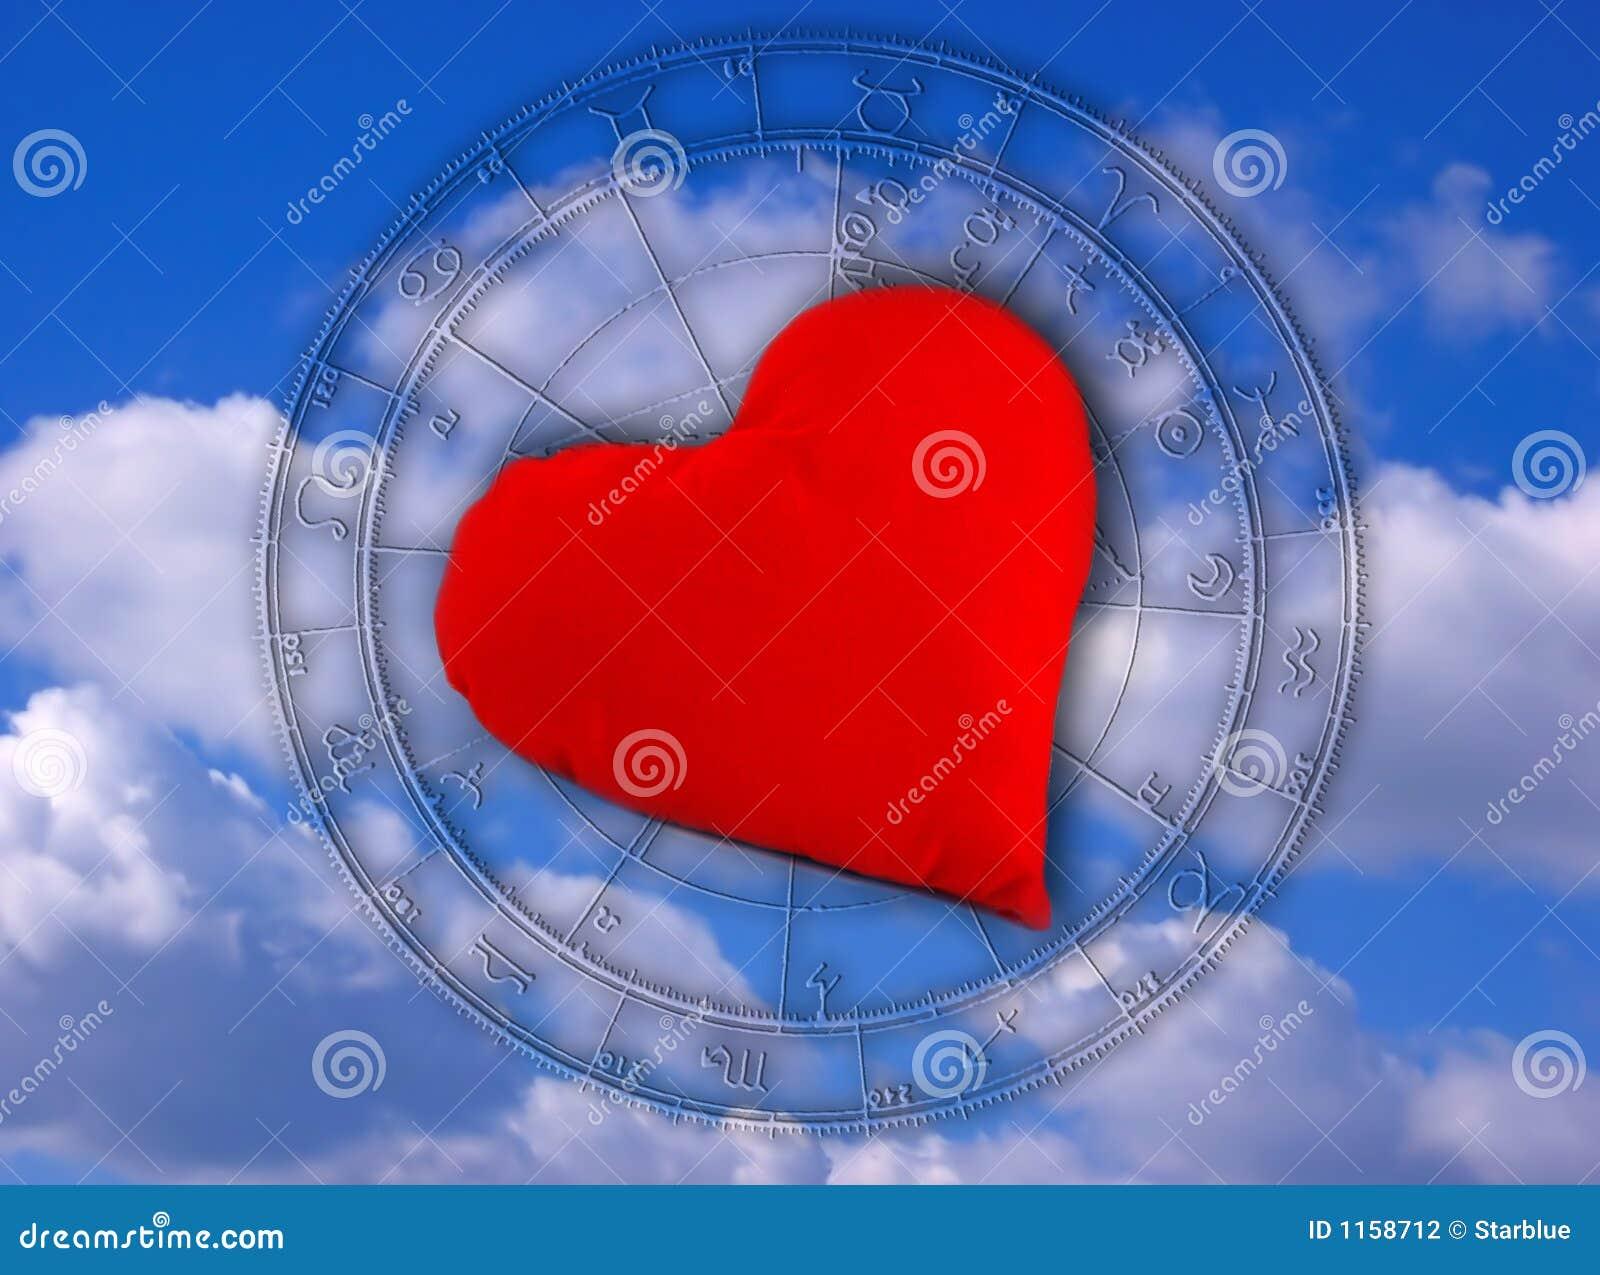 Zodiac and love